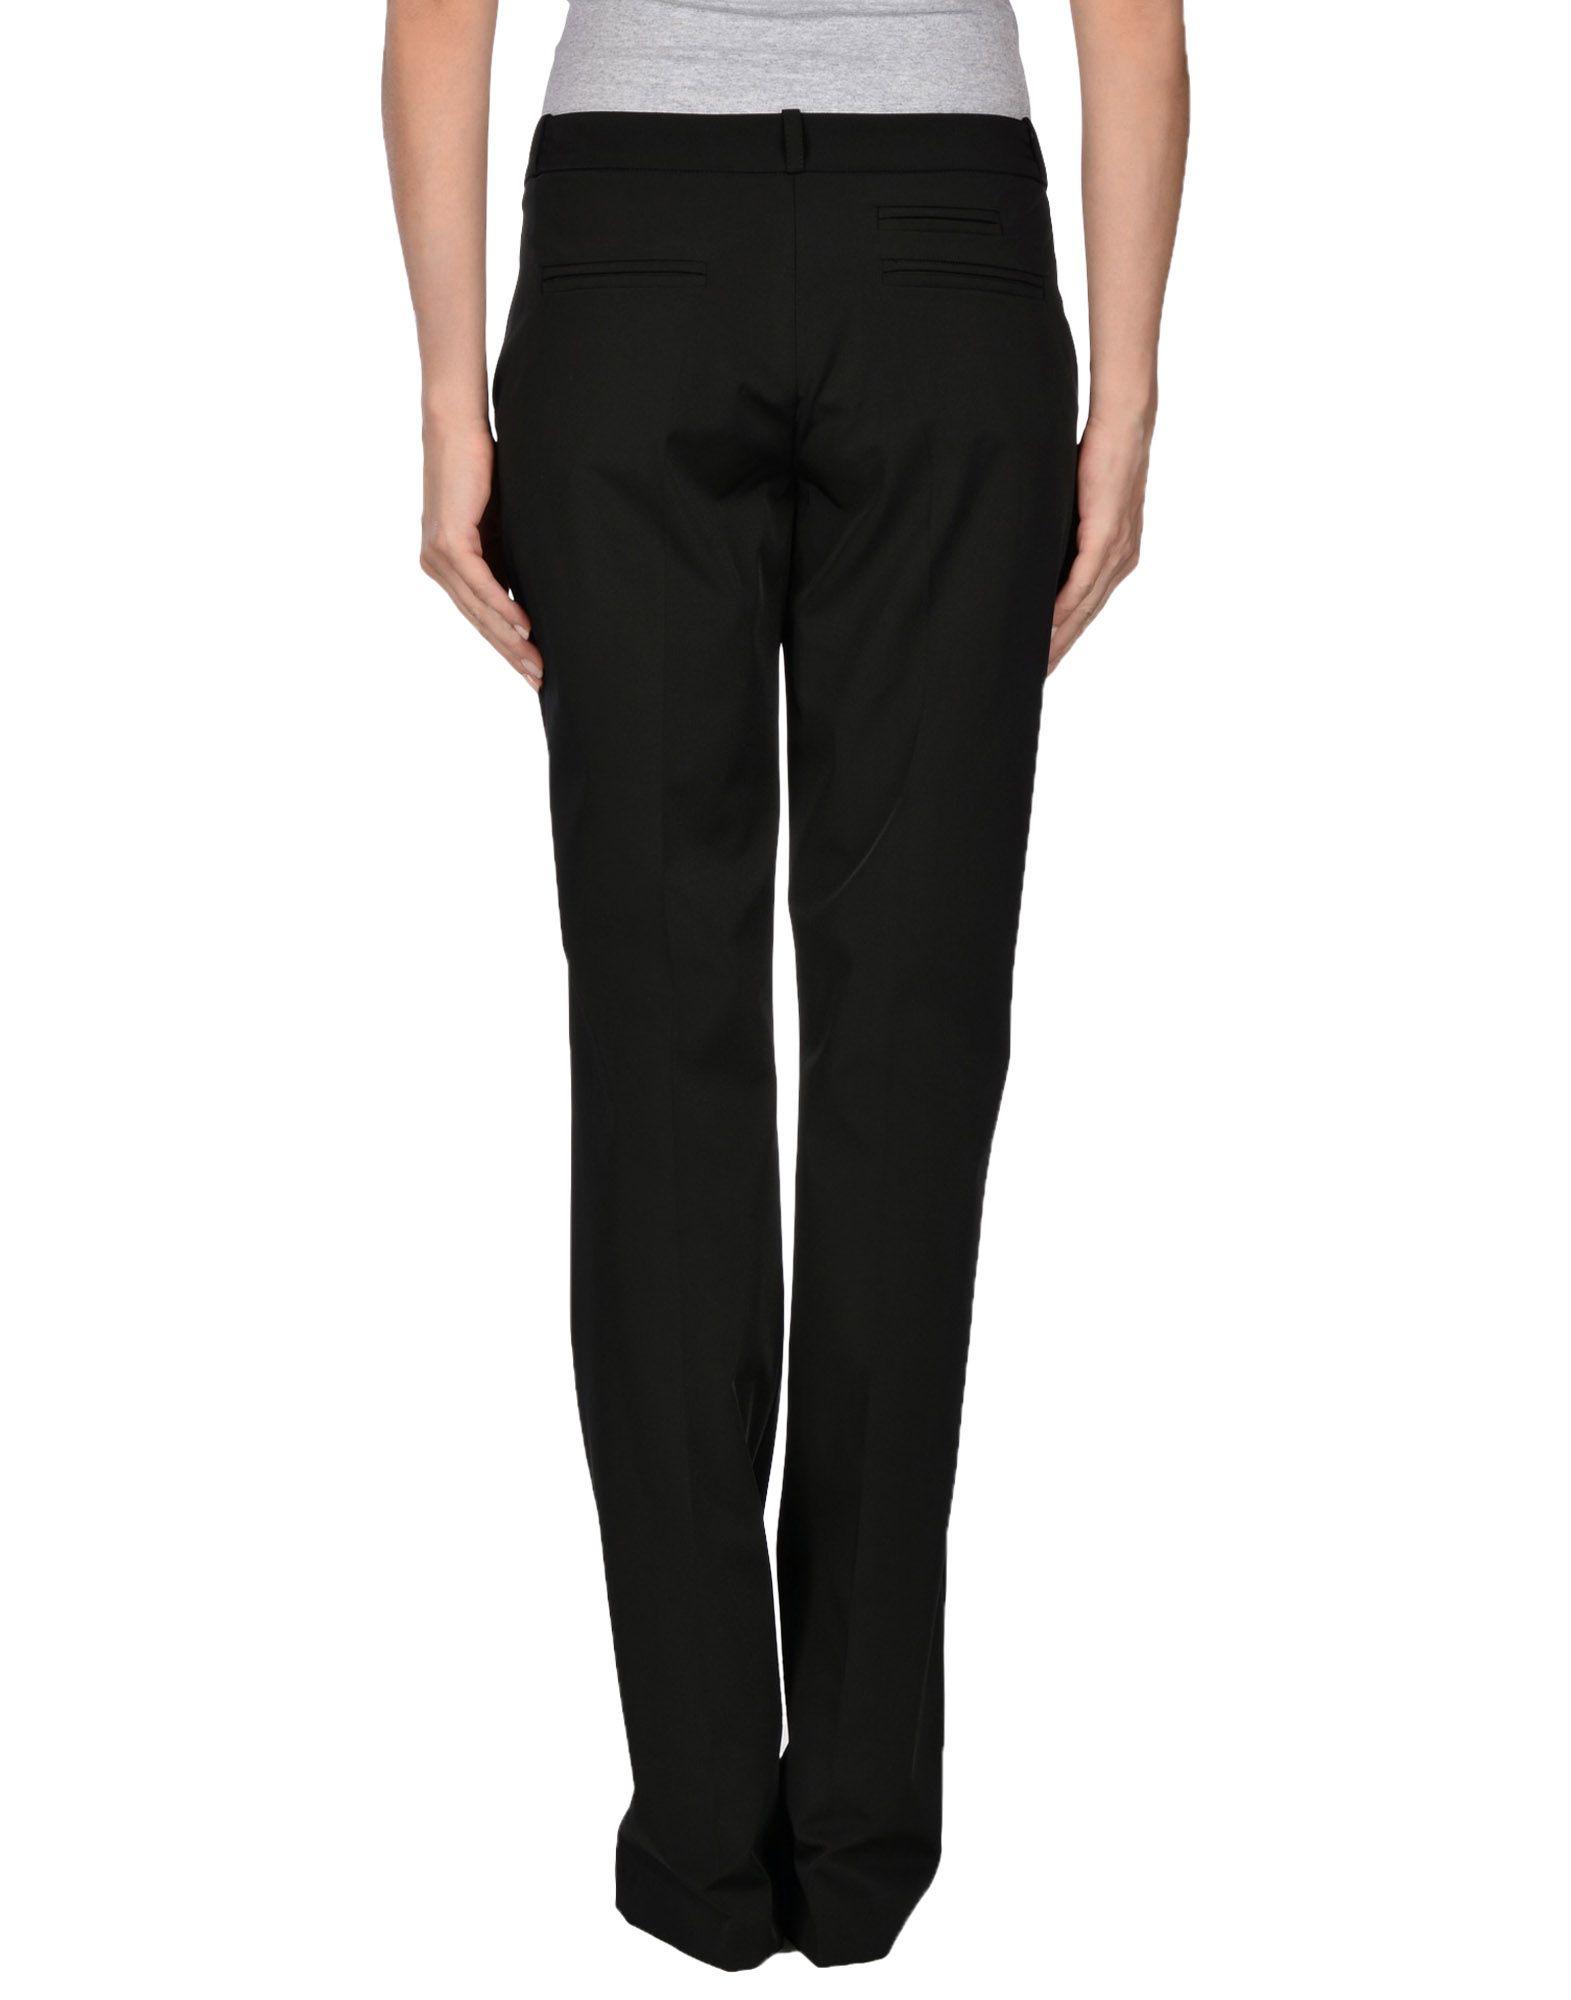 TROUSERS - Casual trousers Lorna Bose J0MCC